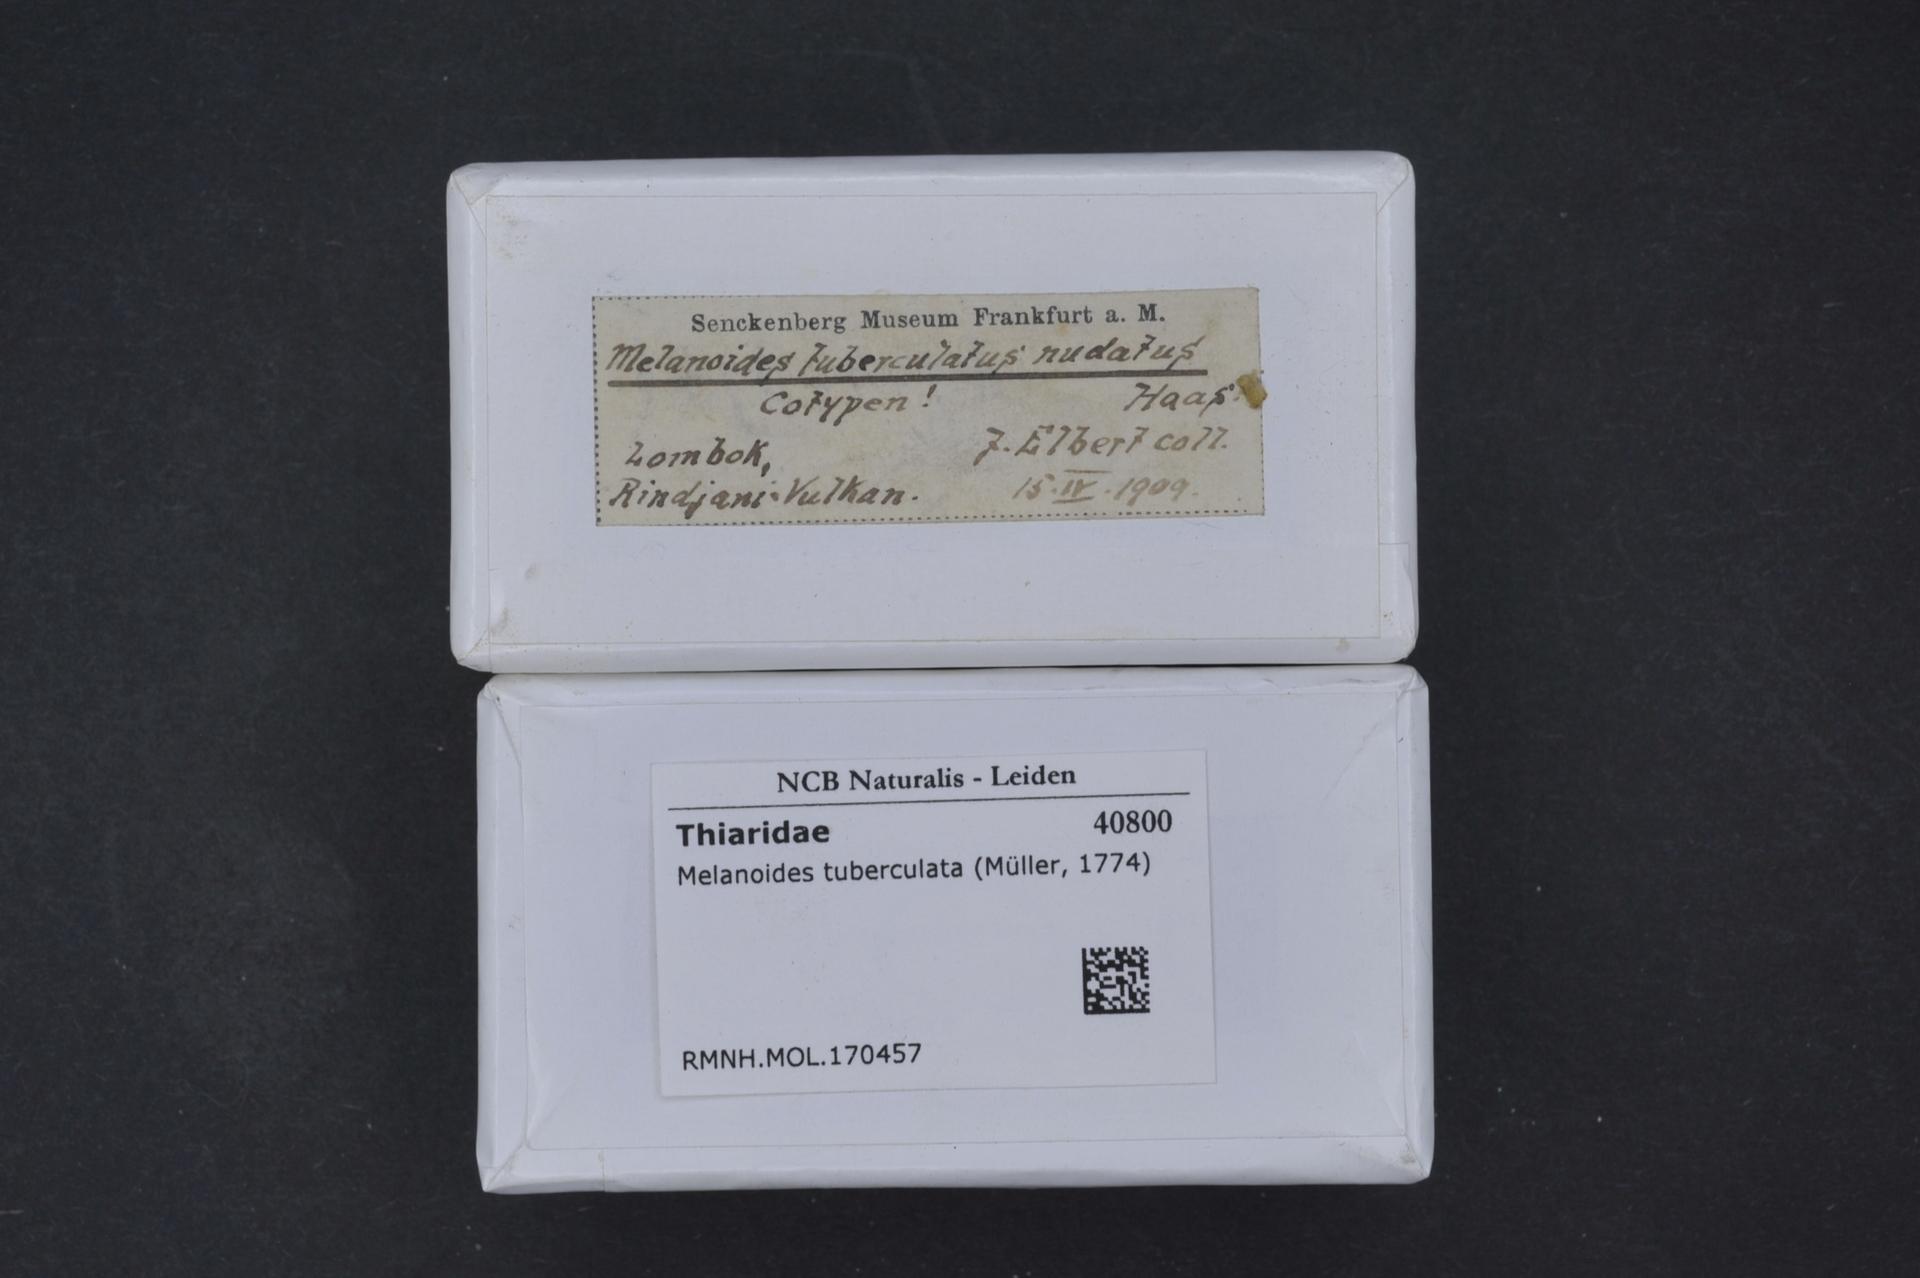 RMNH.MOL.170457 | Melanoides tuberculatus nudatus Haas, 1912